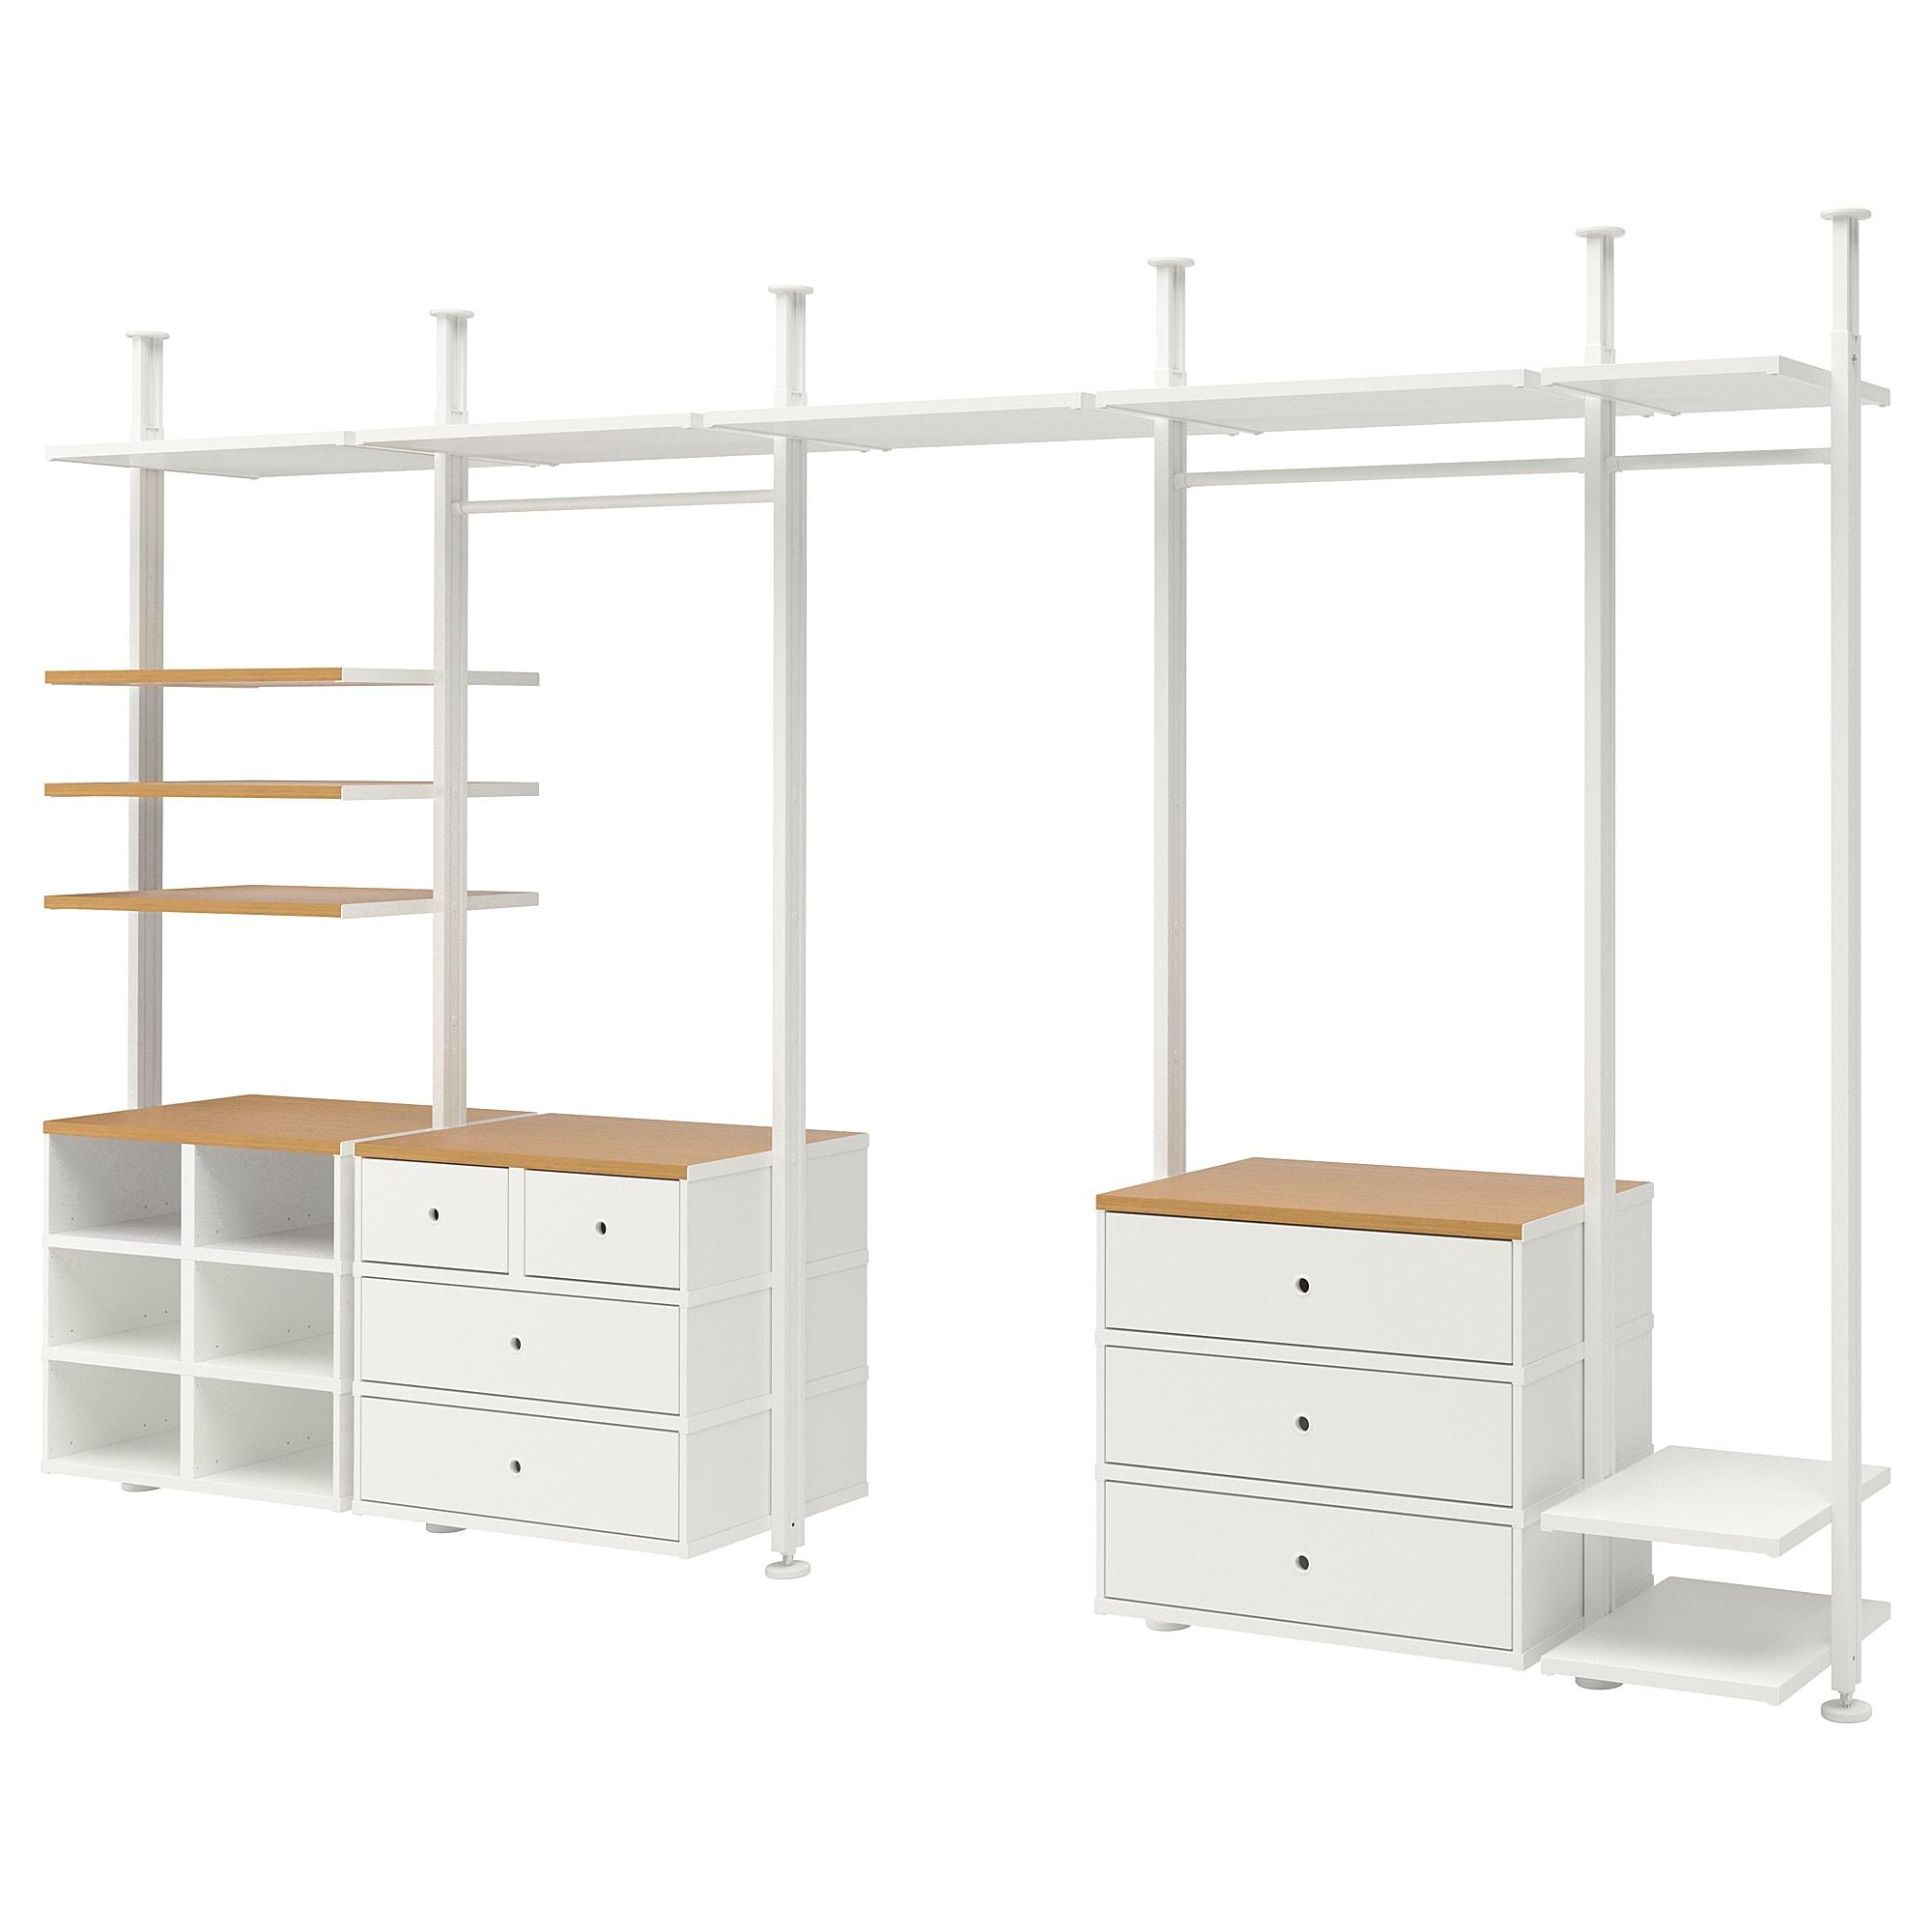 5 секций ЭЛВАРЛИ белый артикуль № 992.517.73 в наличии. Онлайн каталог IKEA Беларусь. Недорогая доставка и установка.